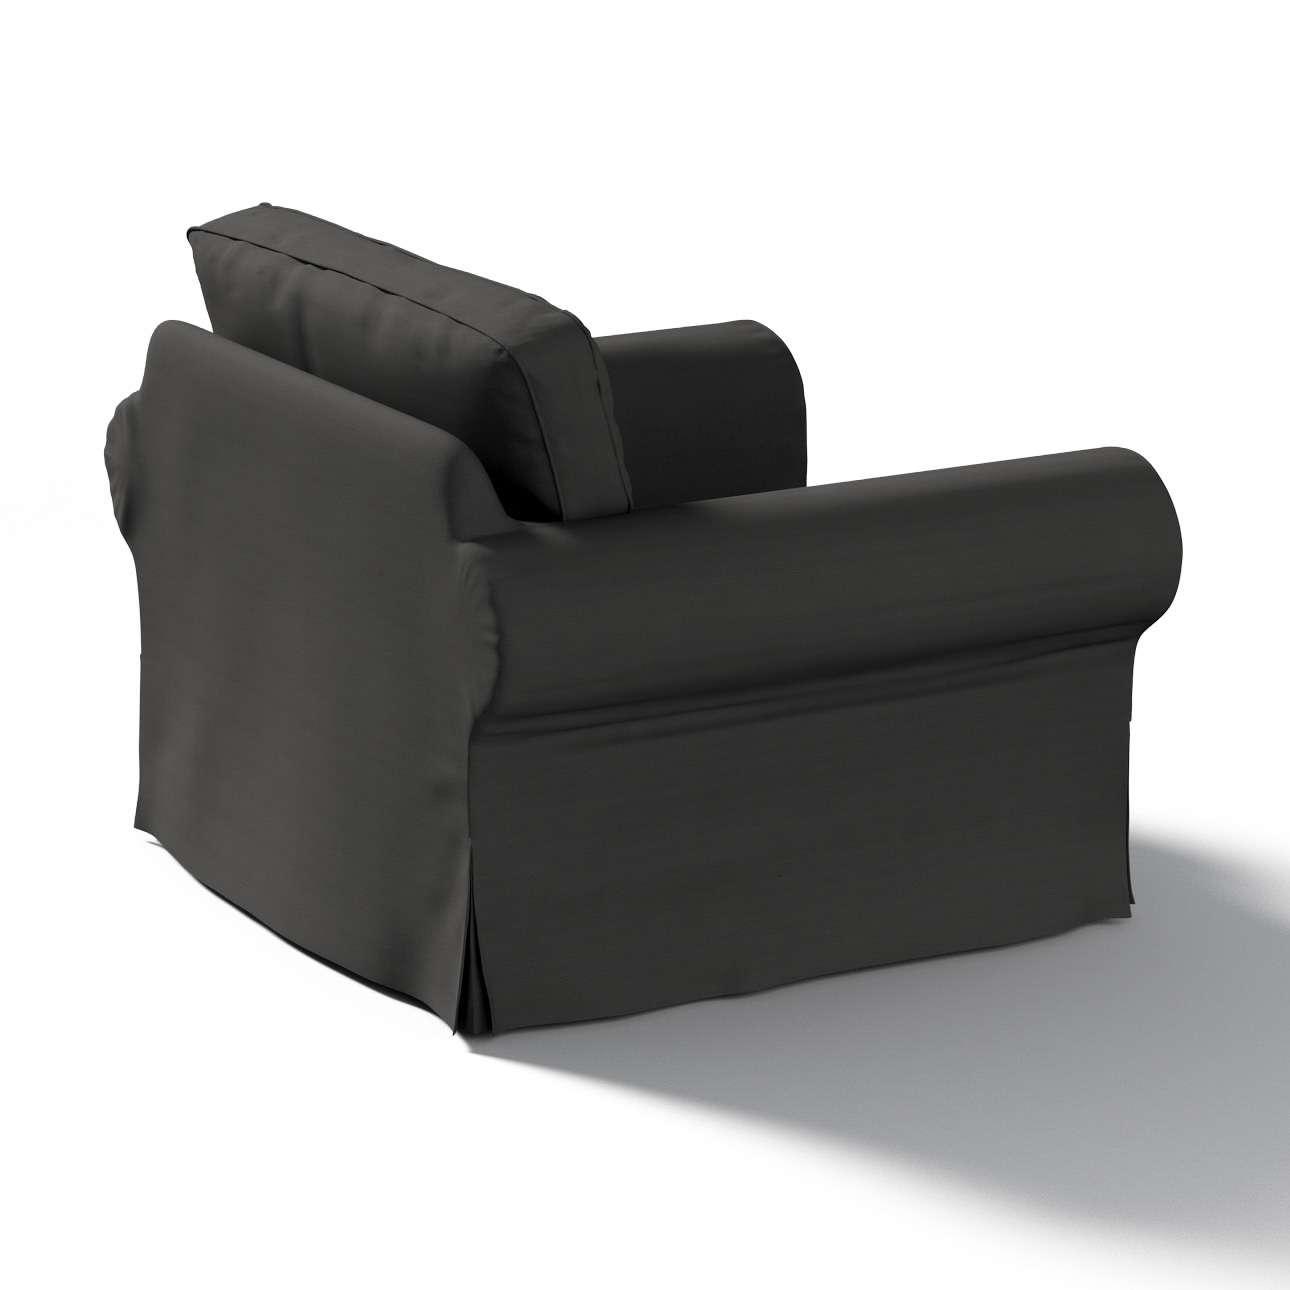 Ektorp Sesselbezug Sesselhusse, Ektorp Sessel von der Kollektion Cotton Panama, Stoff: 702-08